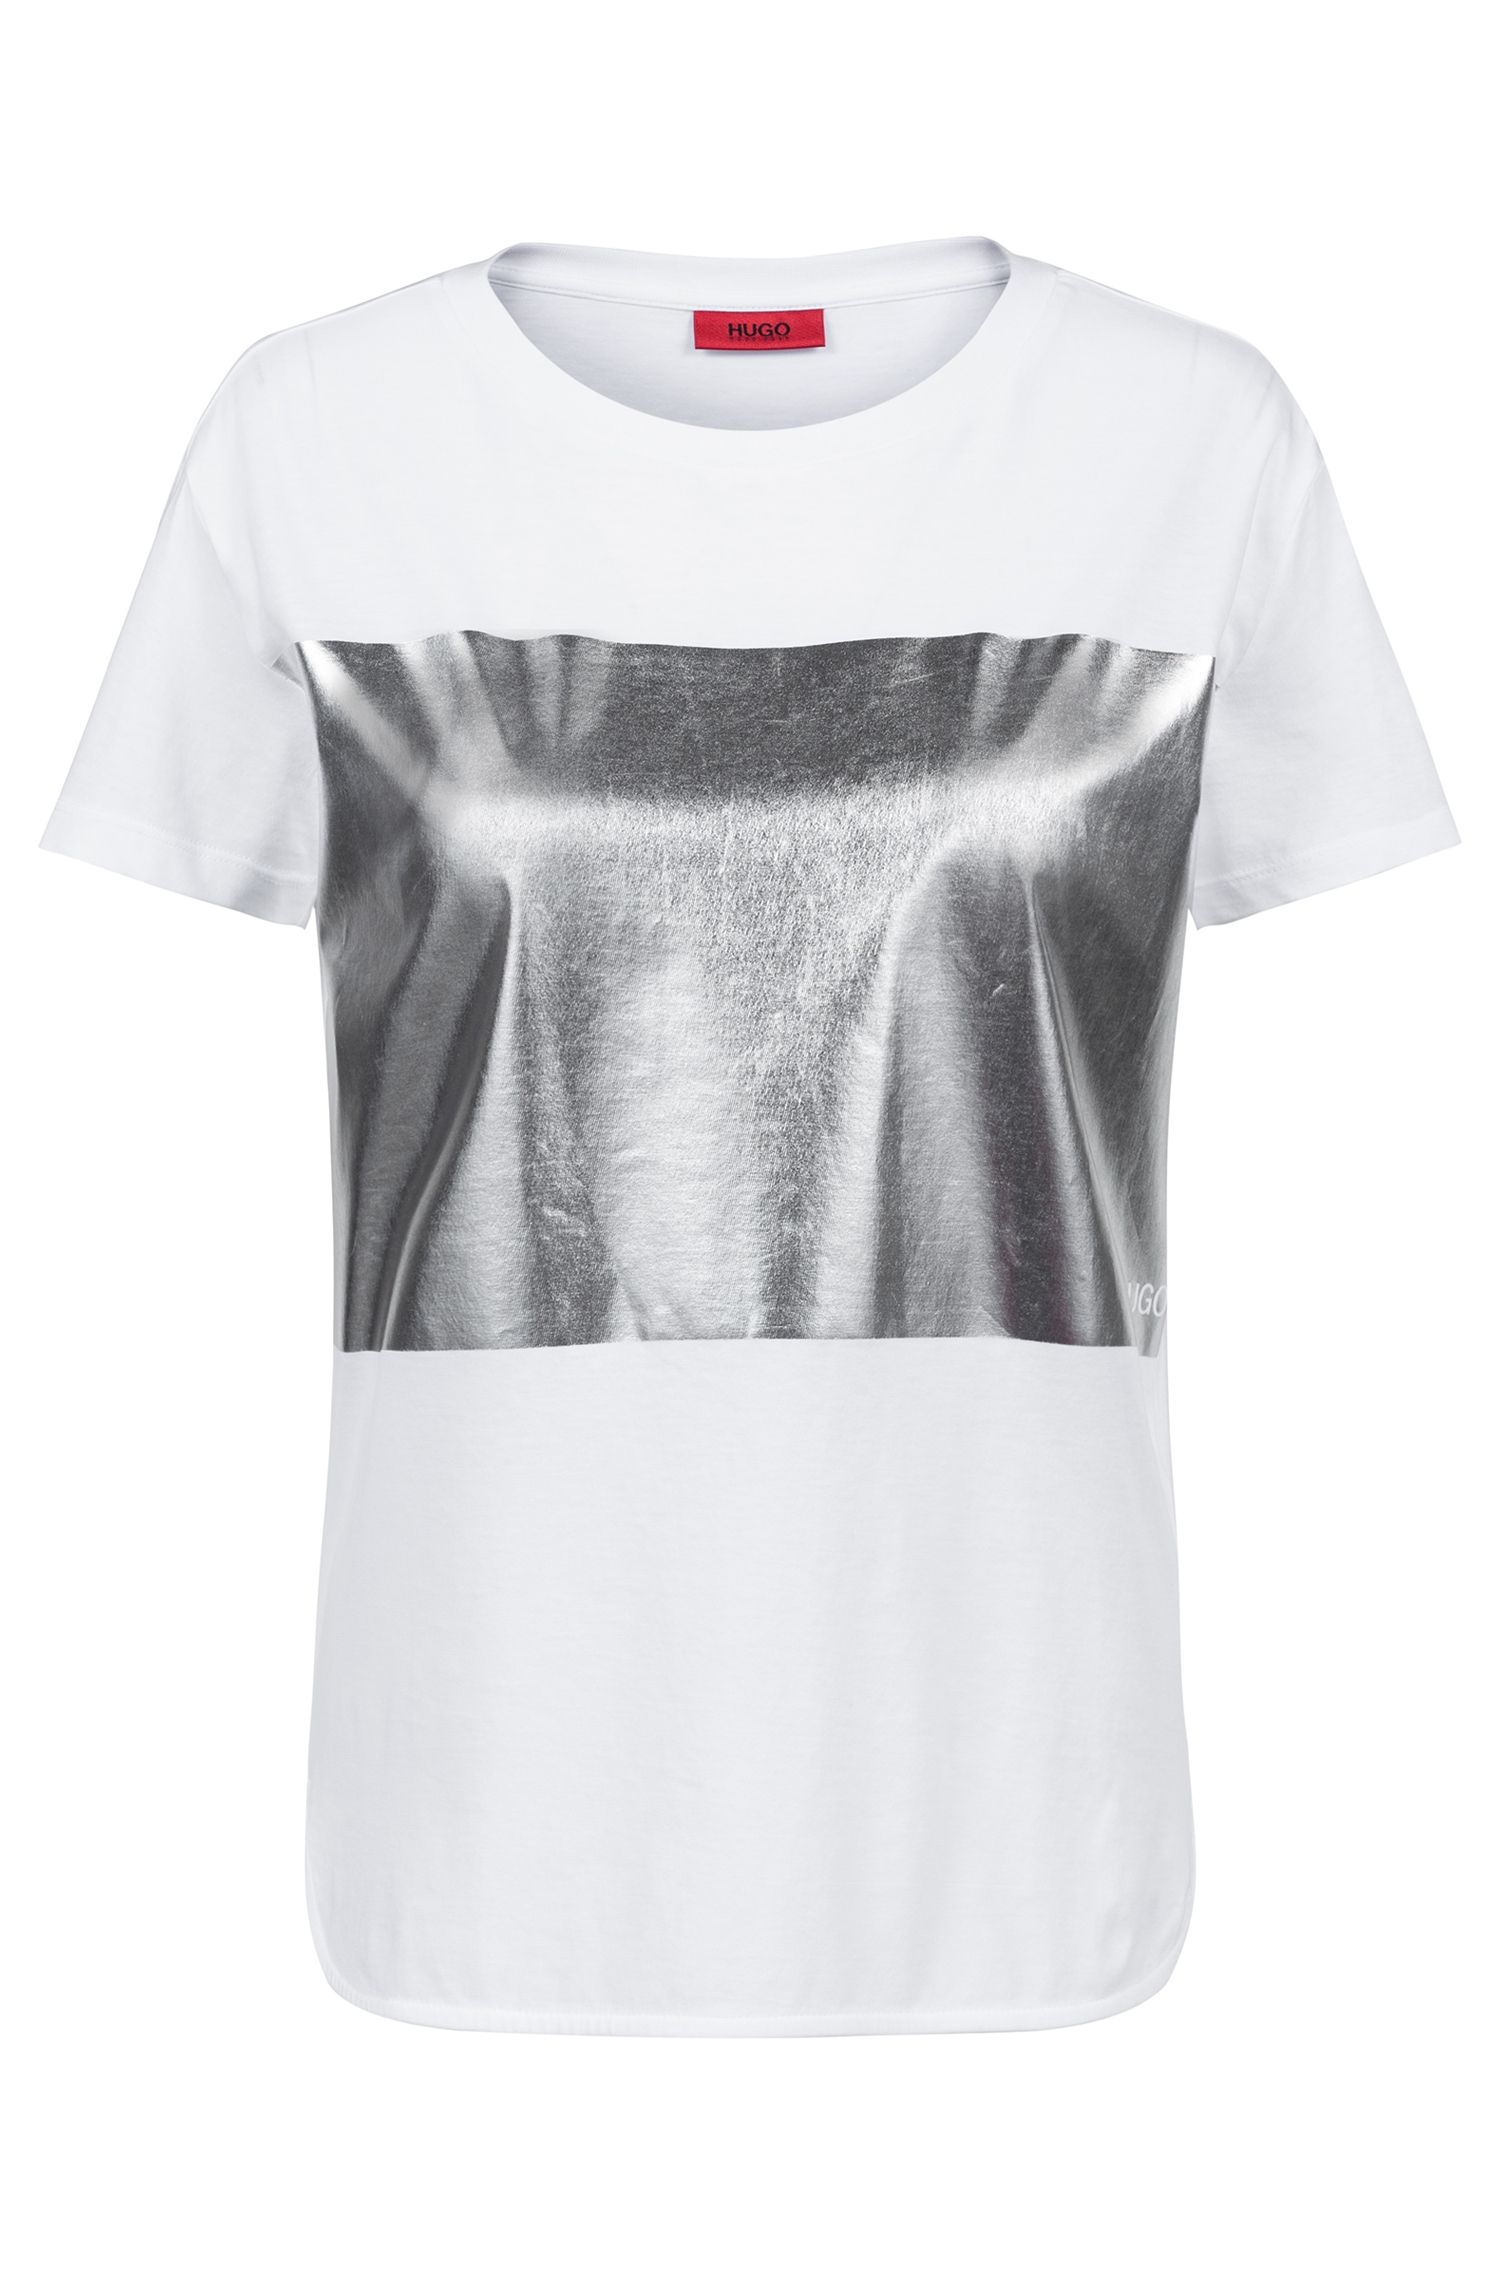 T-Shirt aus Baumwoll-Jersey mit silbernem Folien-Print, Weiß